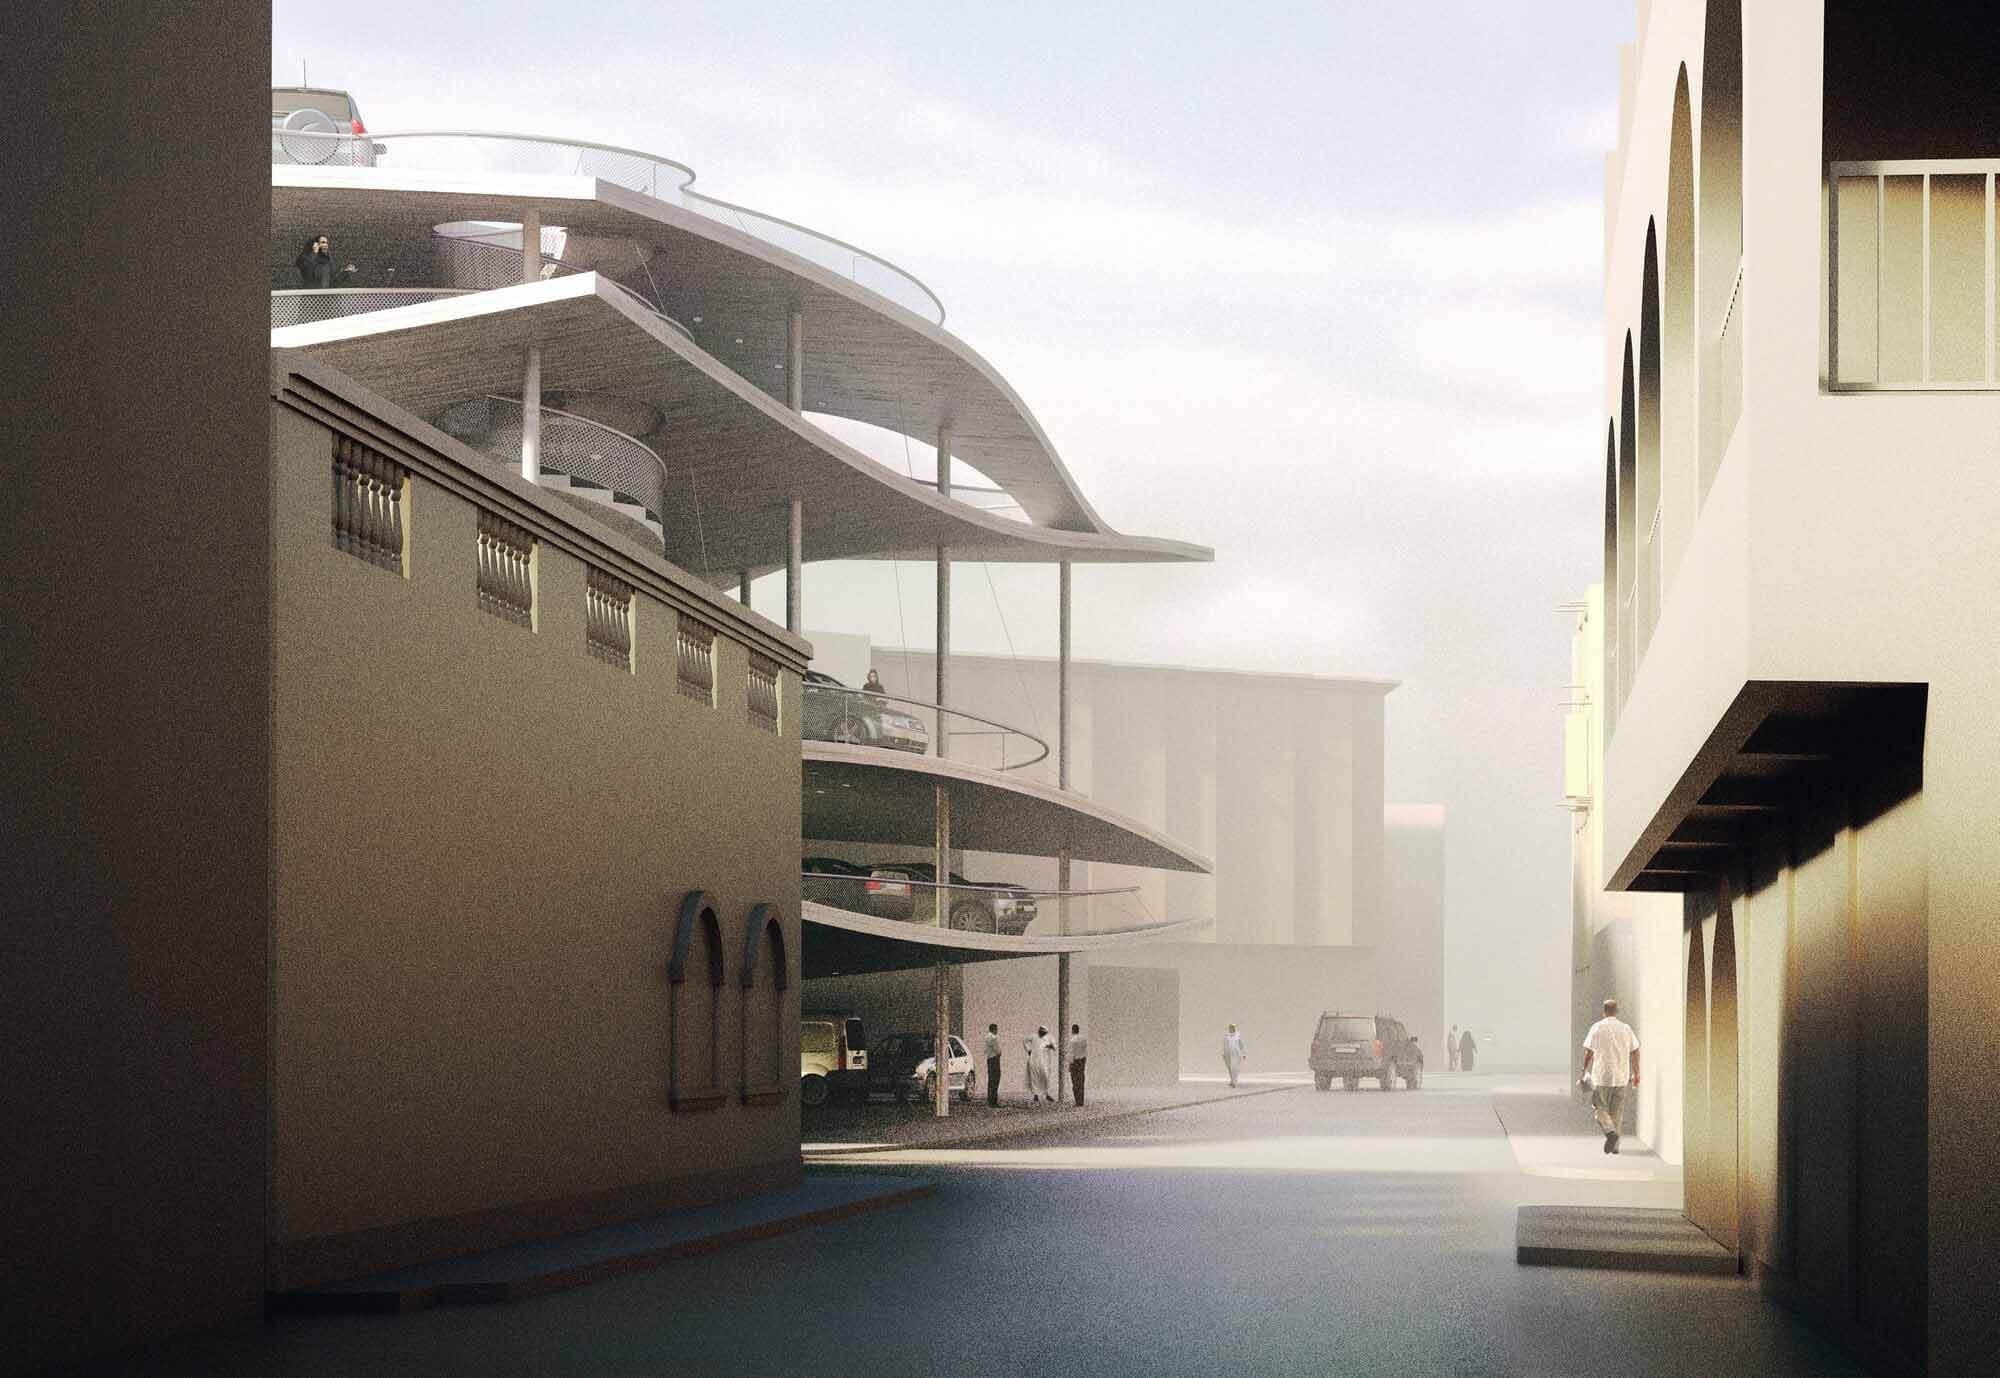 Кристиан Керез проектирует структуру парковки в Бахрейне в рамках проекта Pearl Path